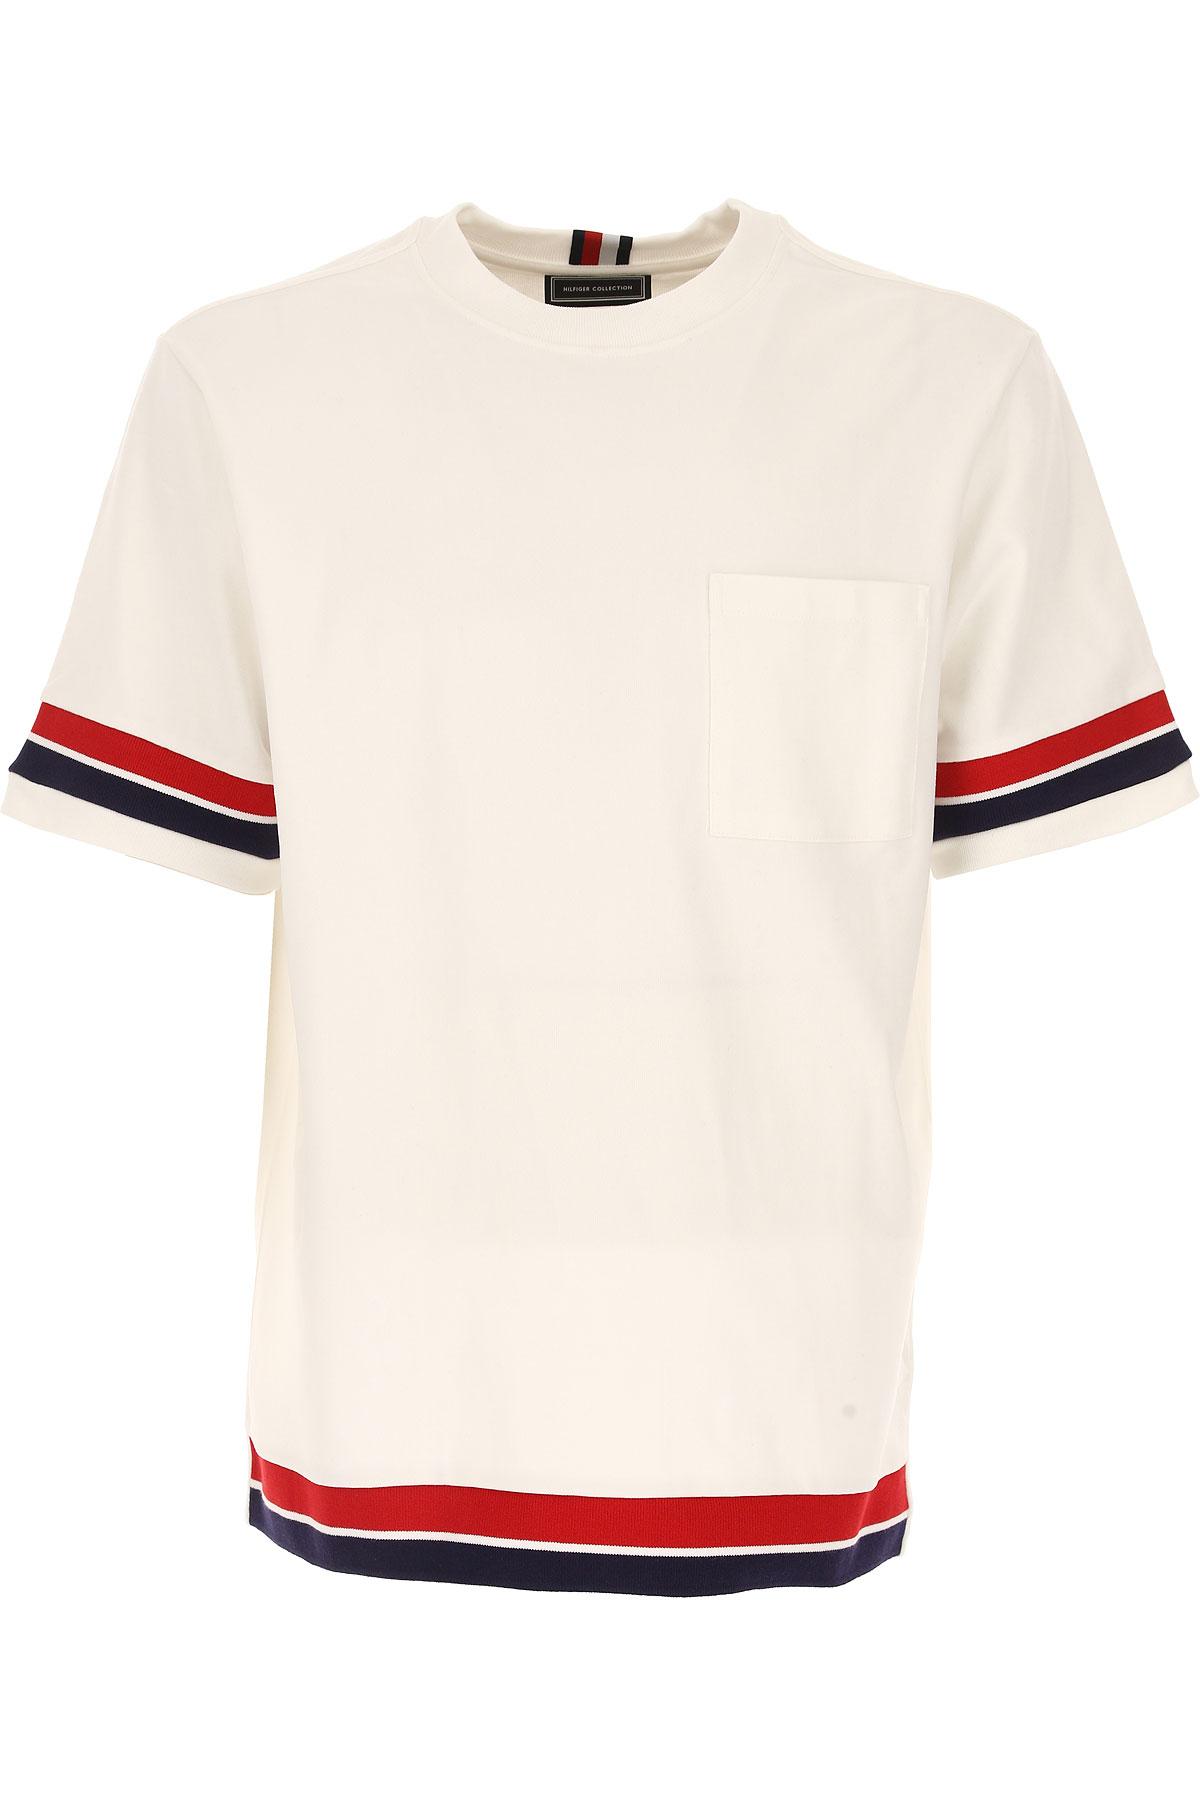 Tommy Hilfiger Sweatshirt for Men On Sale, White, Cotton, 2017, L M S USA-441961